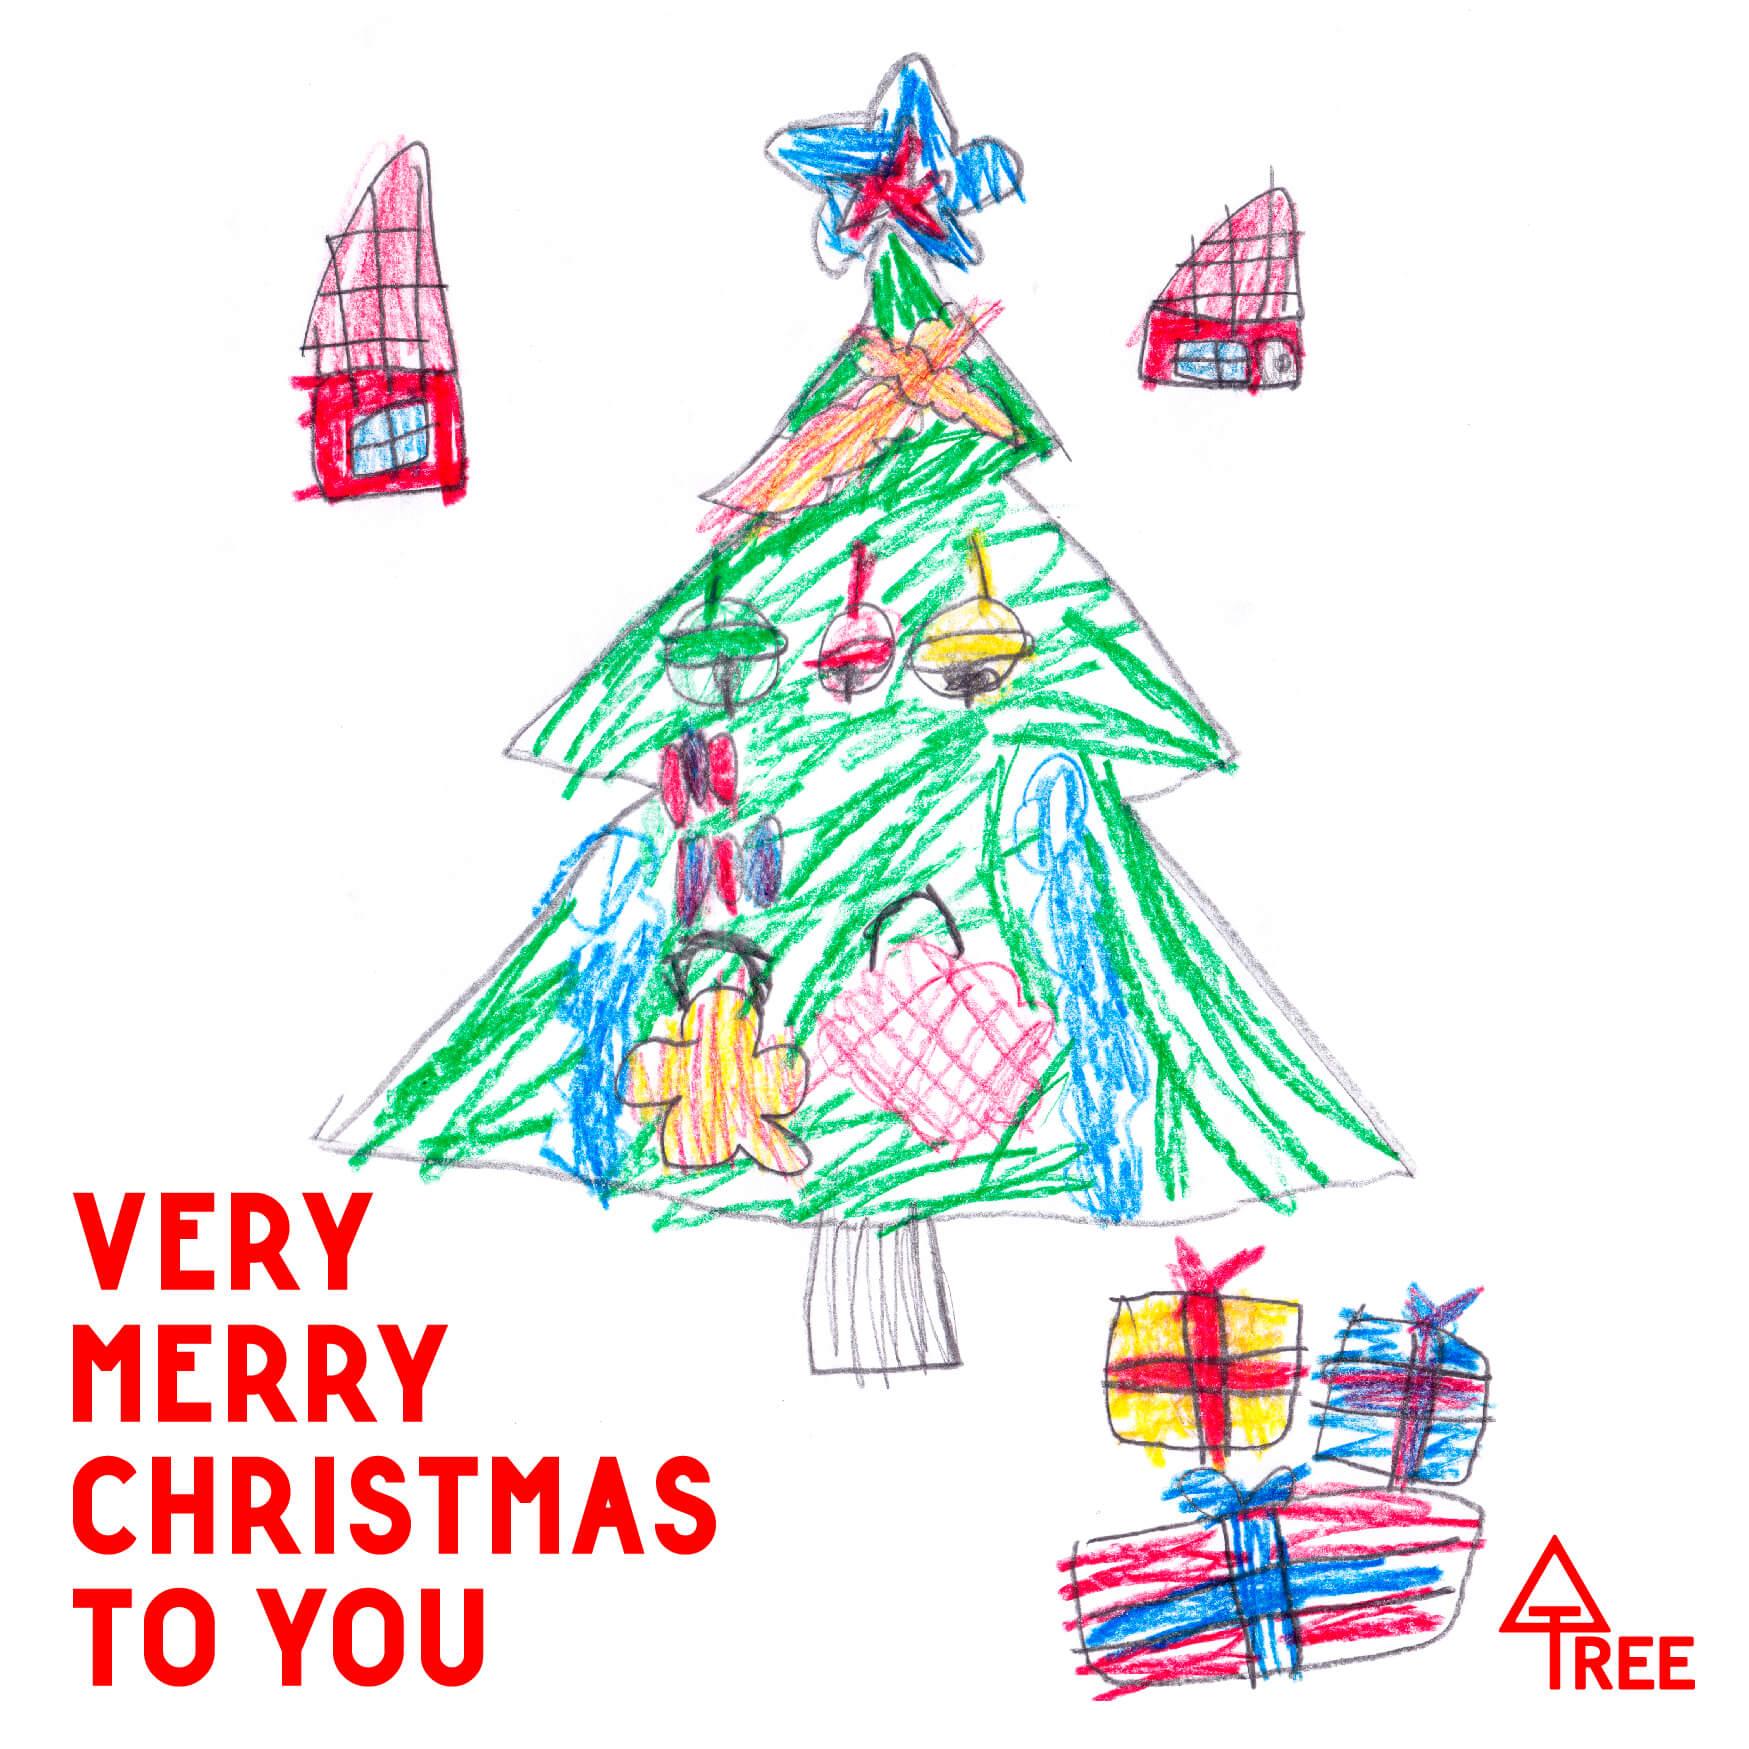 TREE Christmas 2020